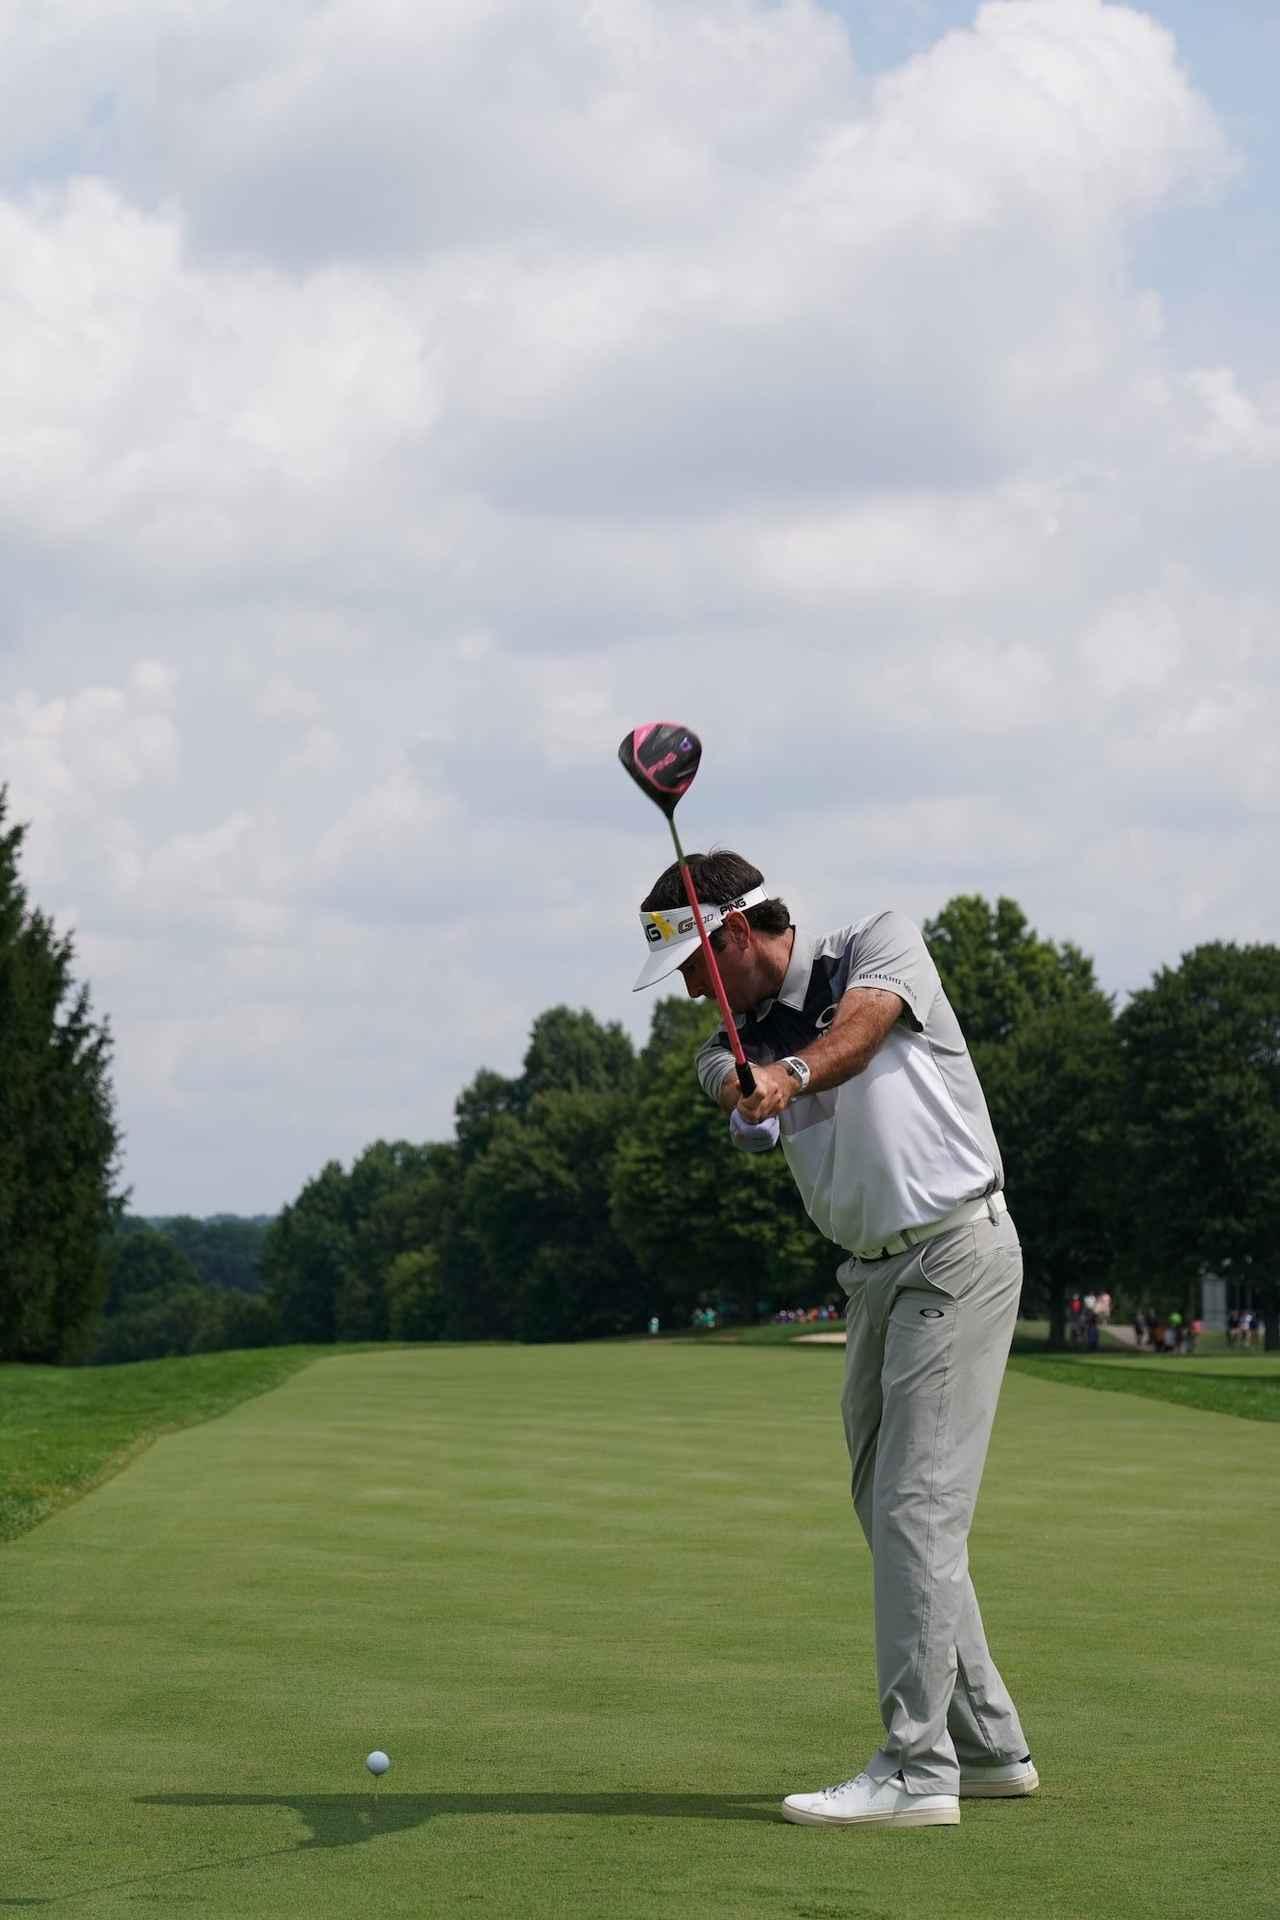 Images : 4番目の画像 - 強烈! バッバ・ワトソンのドライバーショット - みんなのゴルフダイジェスト